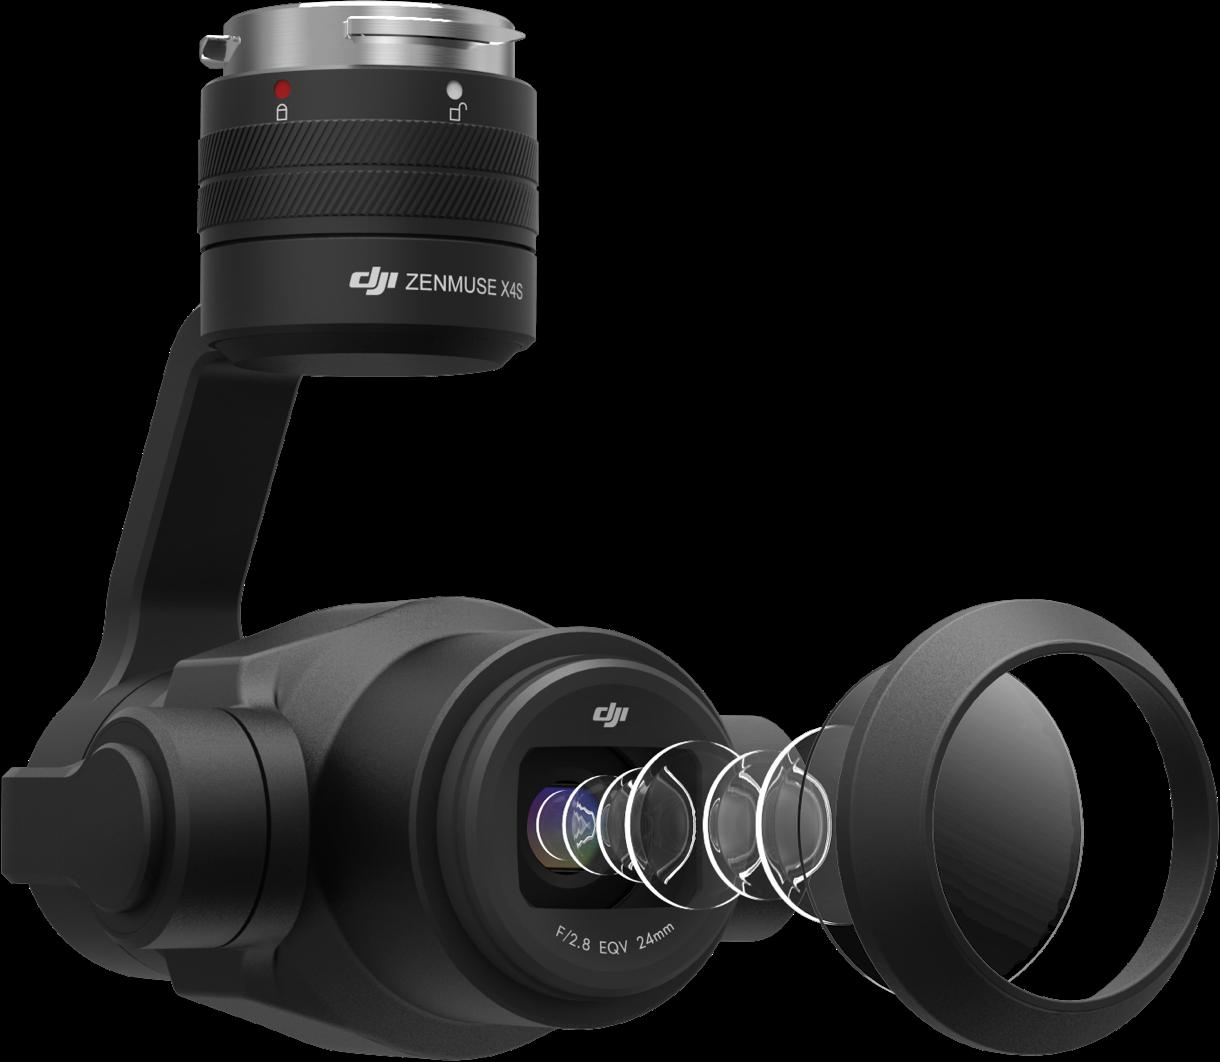 pro lens